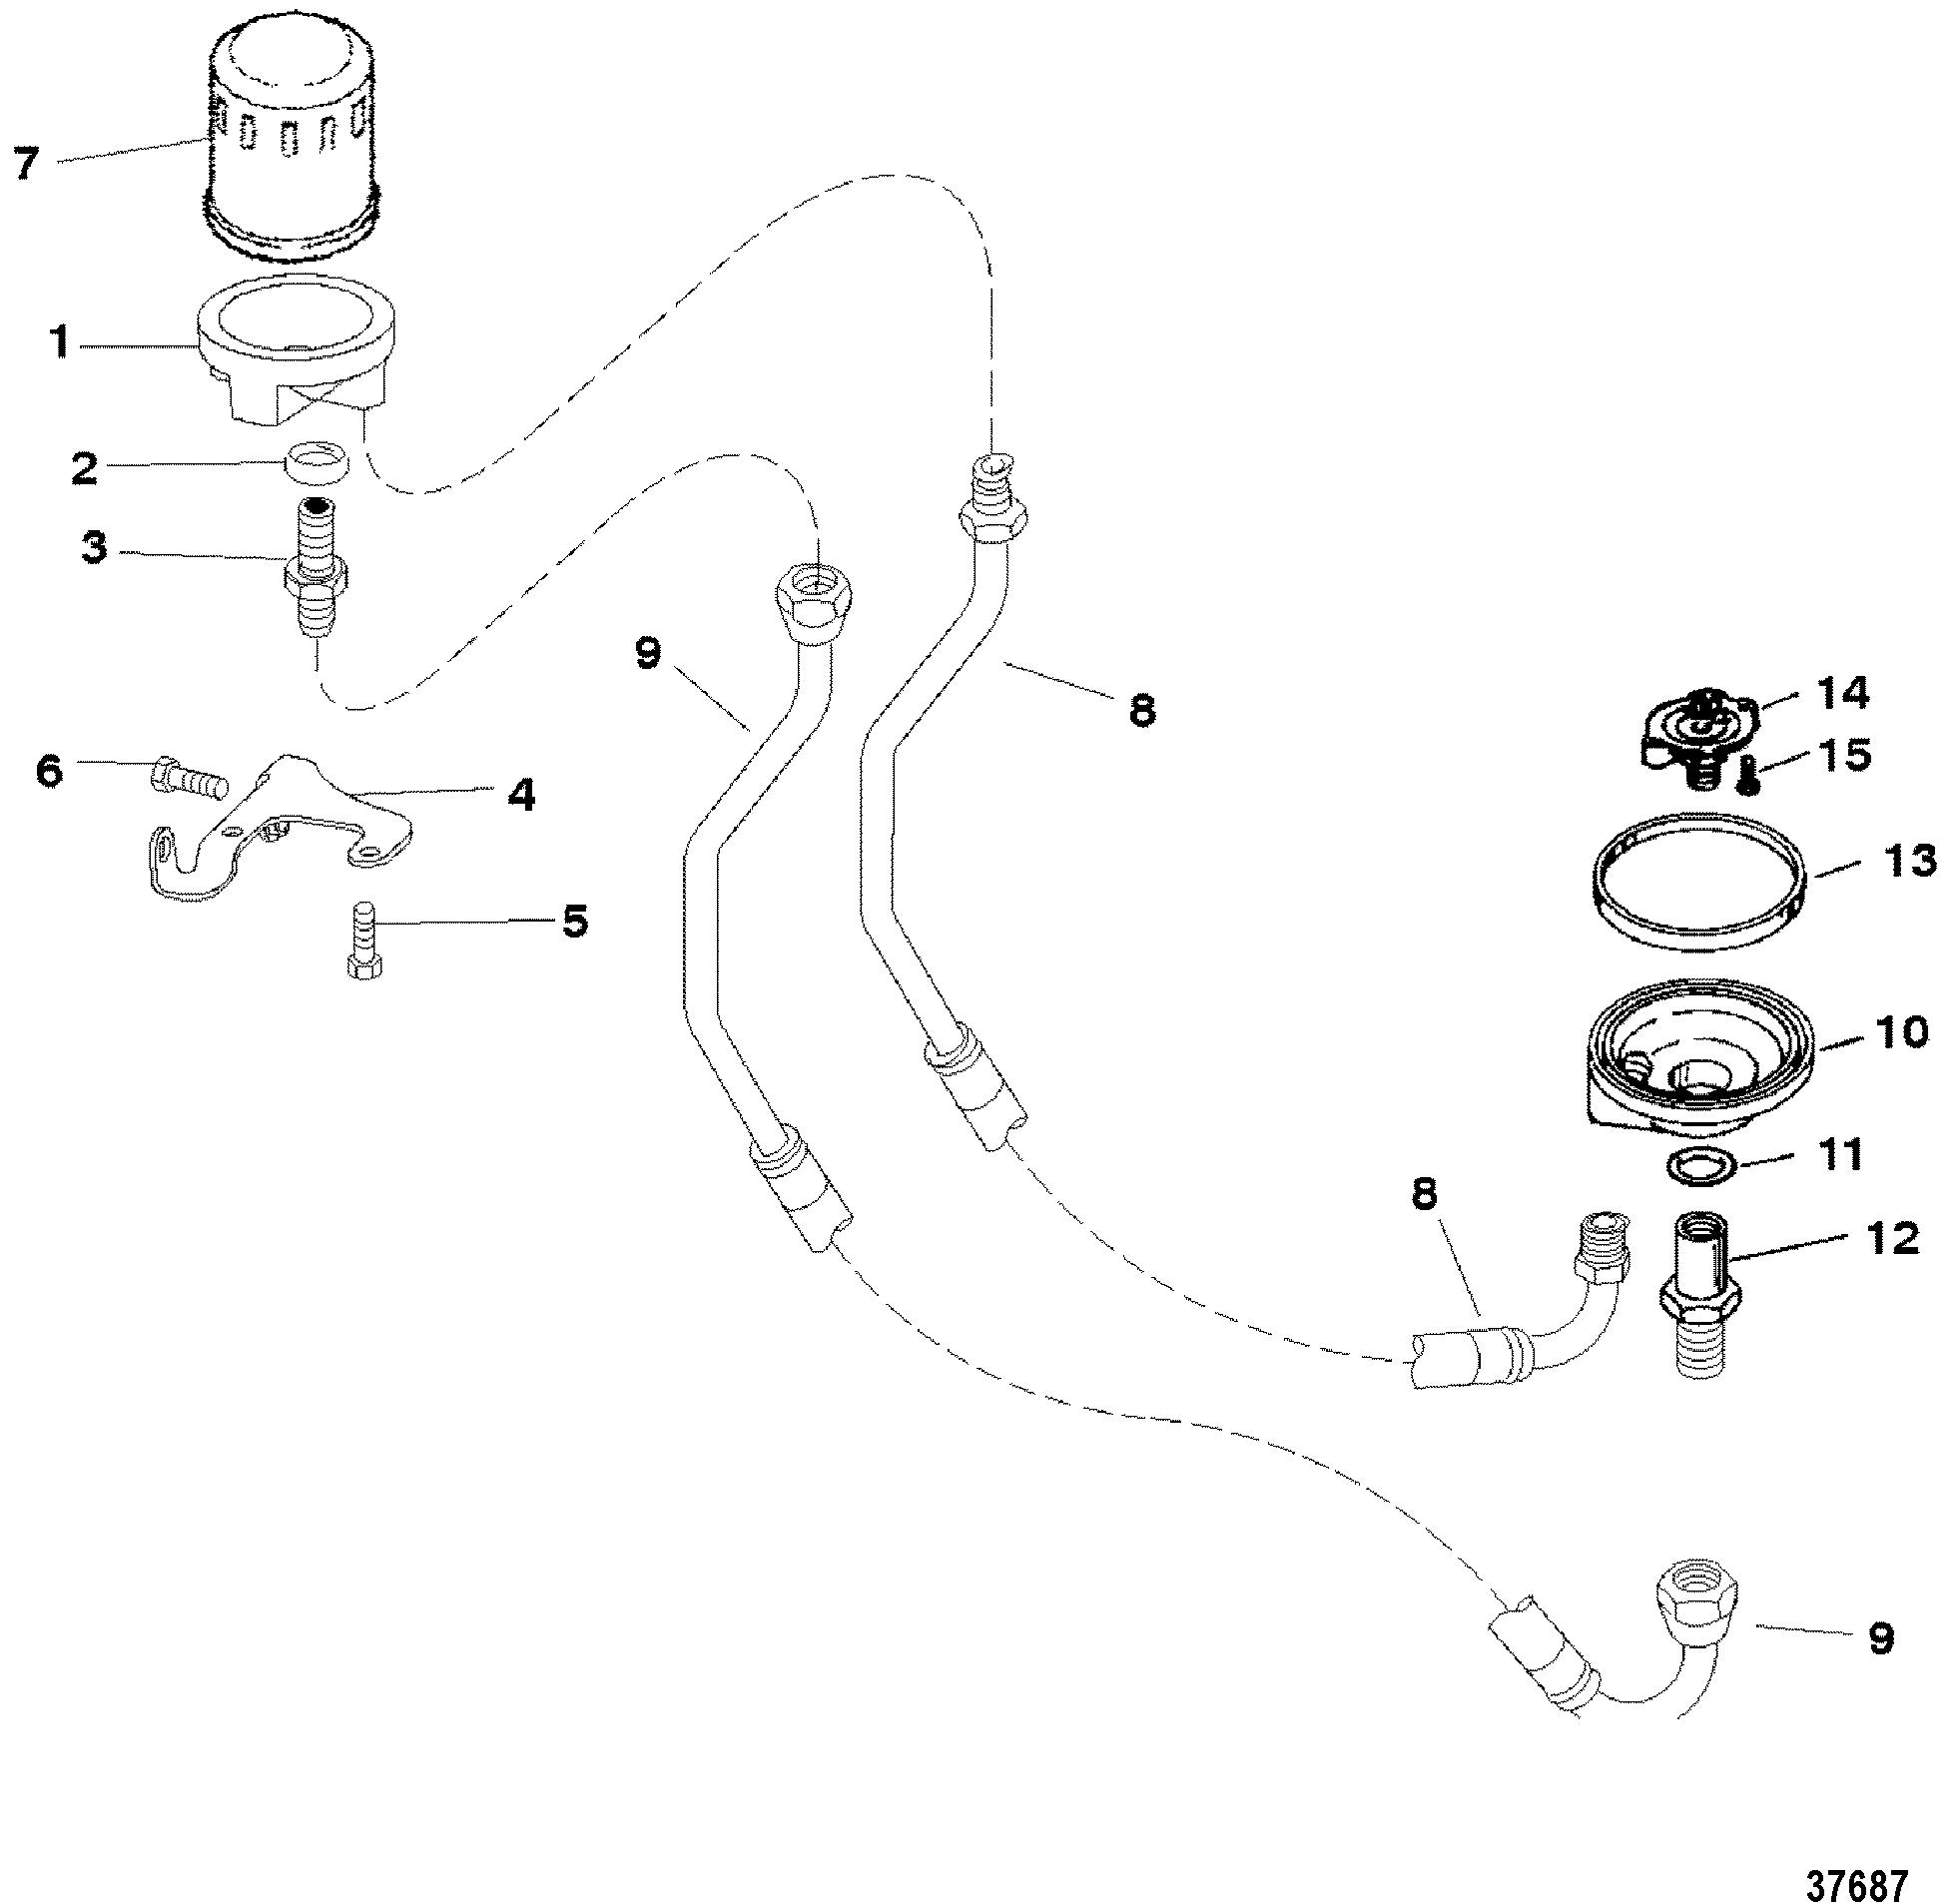 Remote Oil Filter For Mercruiser 5 7l 2bbl 5 7lx 4bbl 350